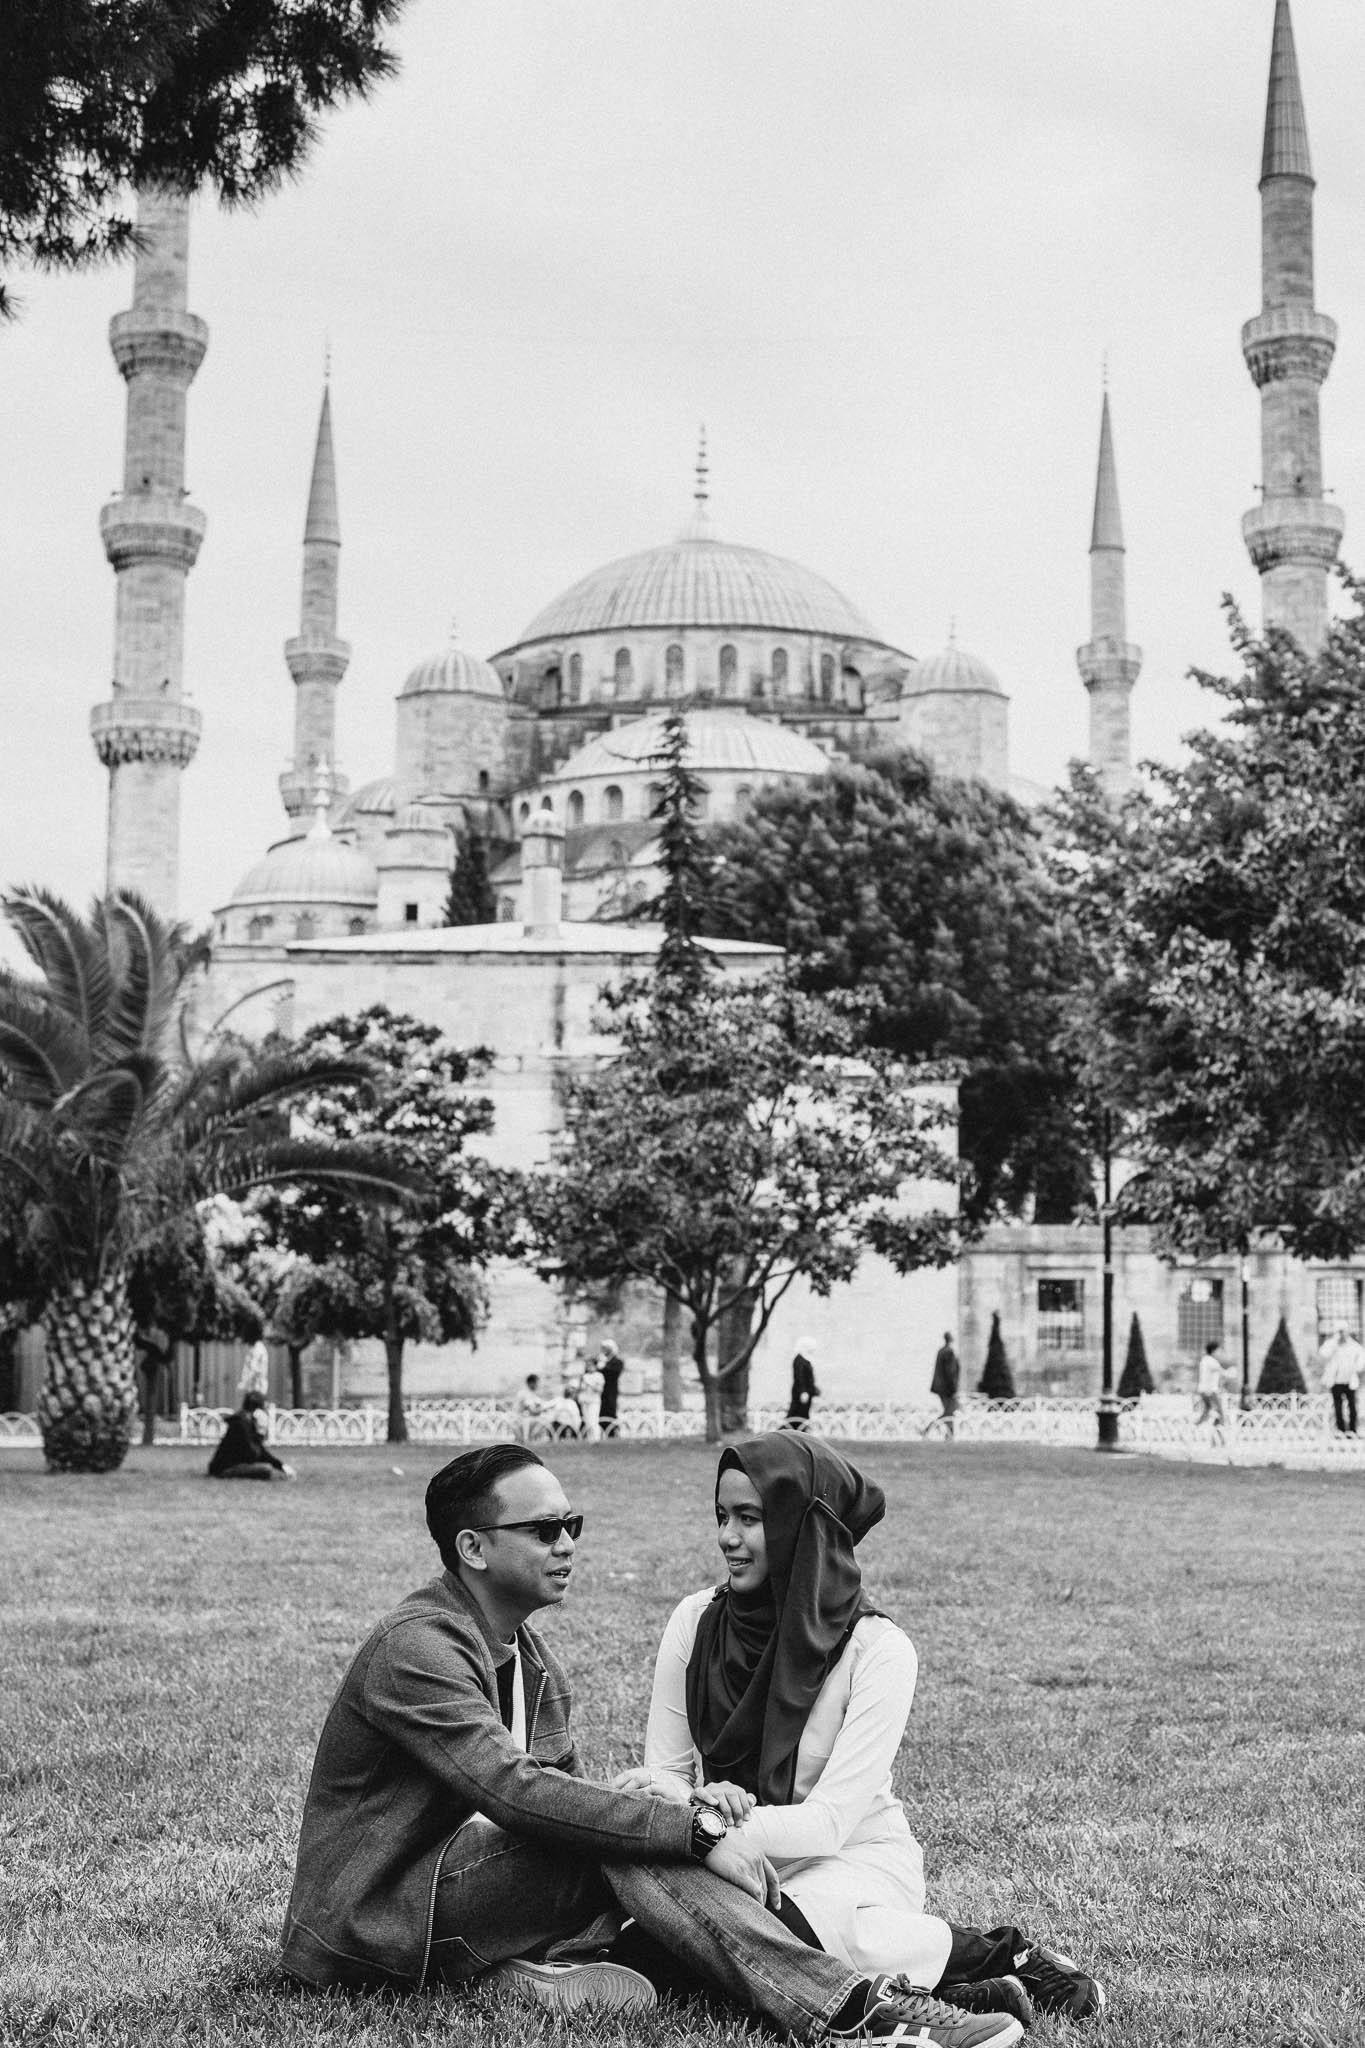 singapore-wedding-photographer-dzul-isma-istanbul-wmt-05.jpg